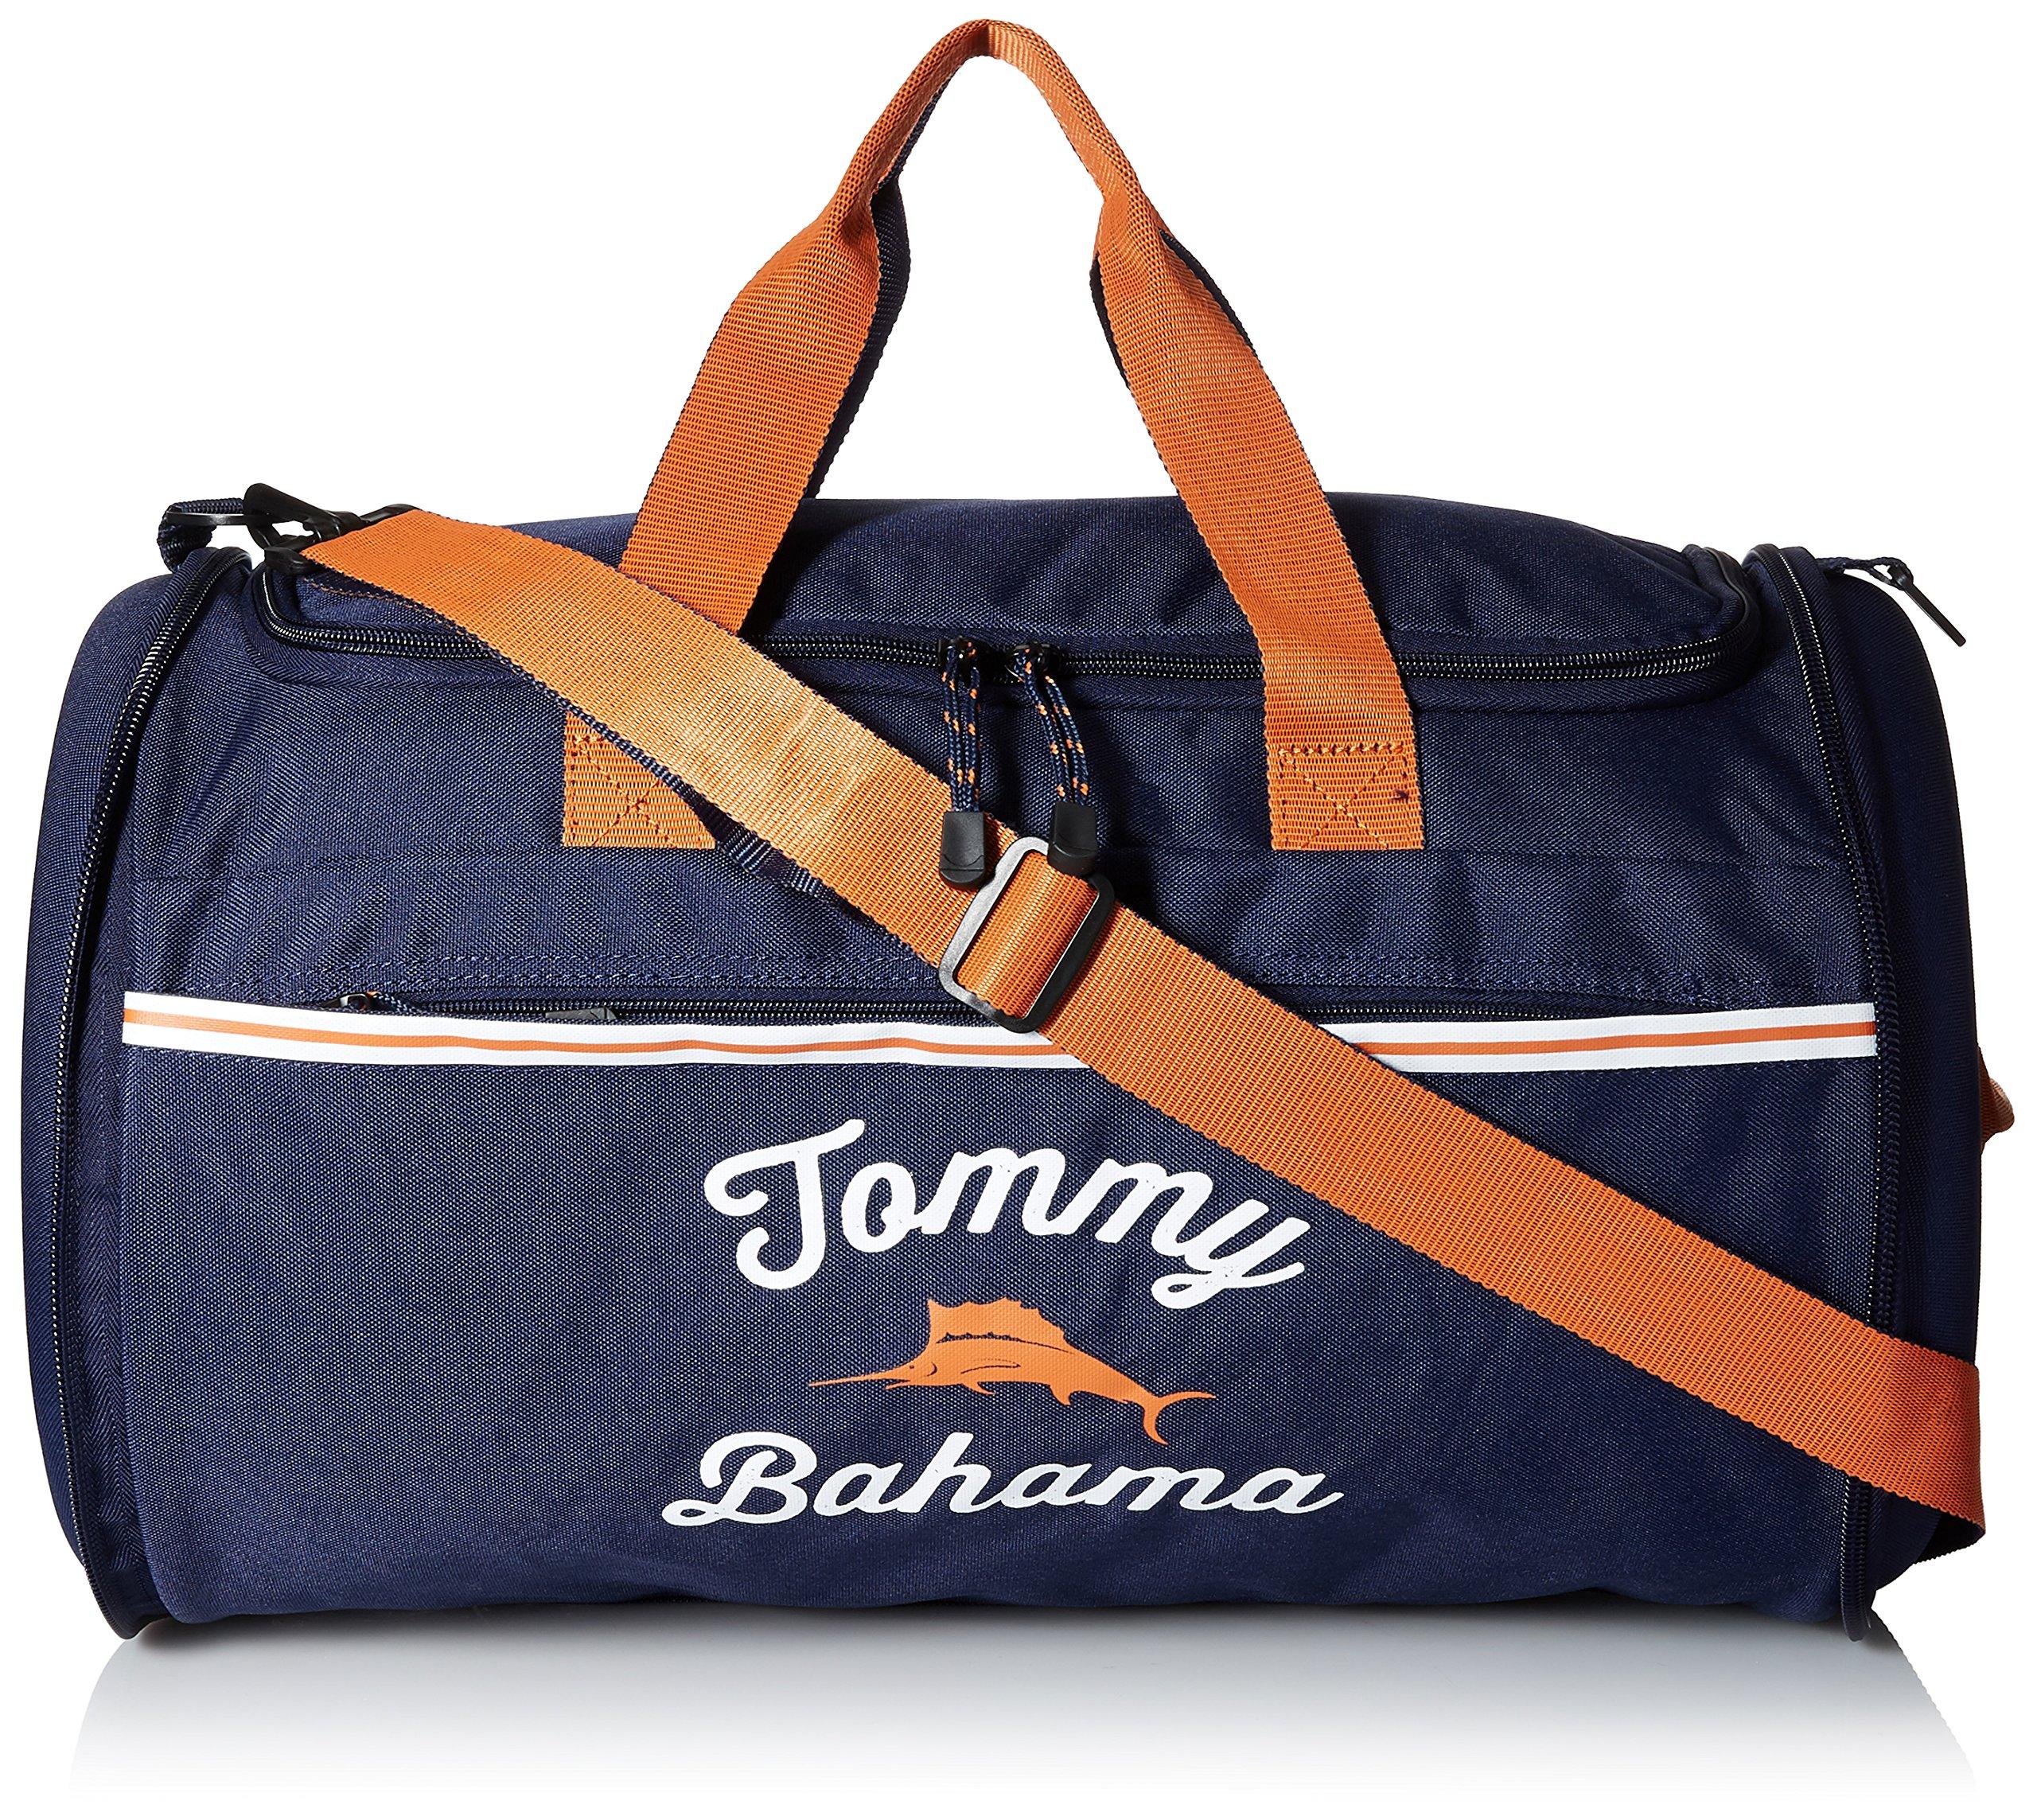 Tommy Bahama Travel Carry Duffle Bag, Navy/Orange/Navy